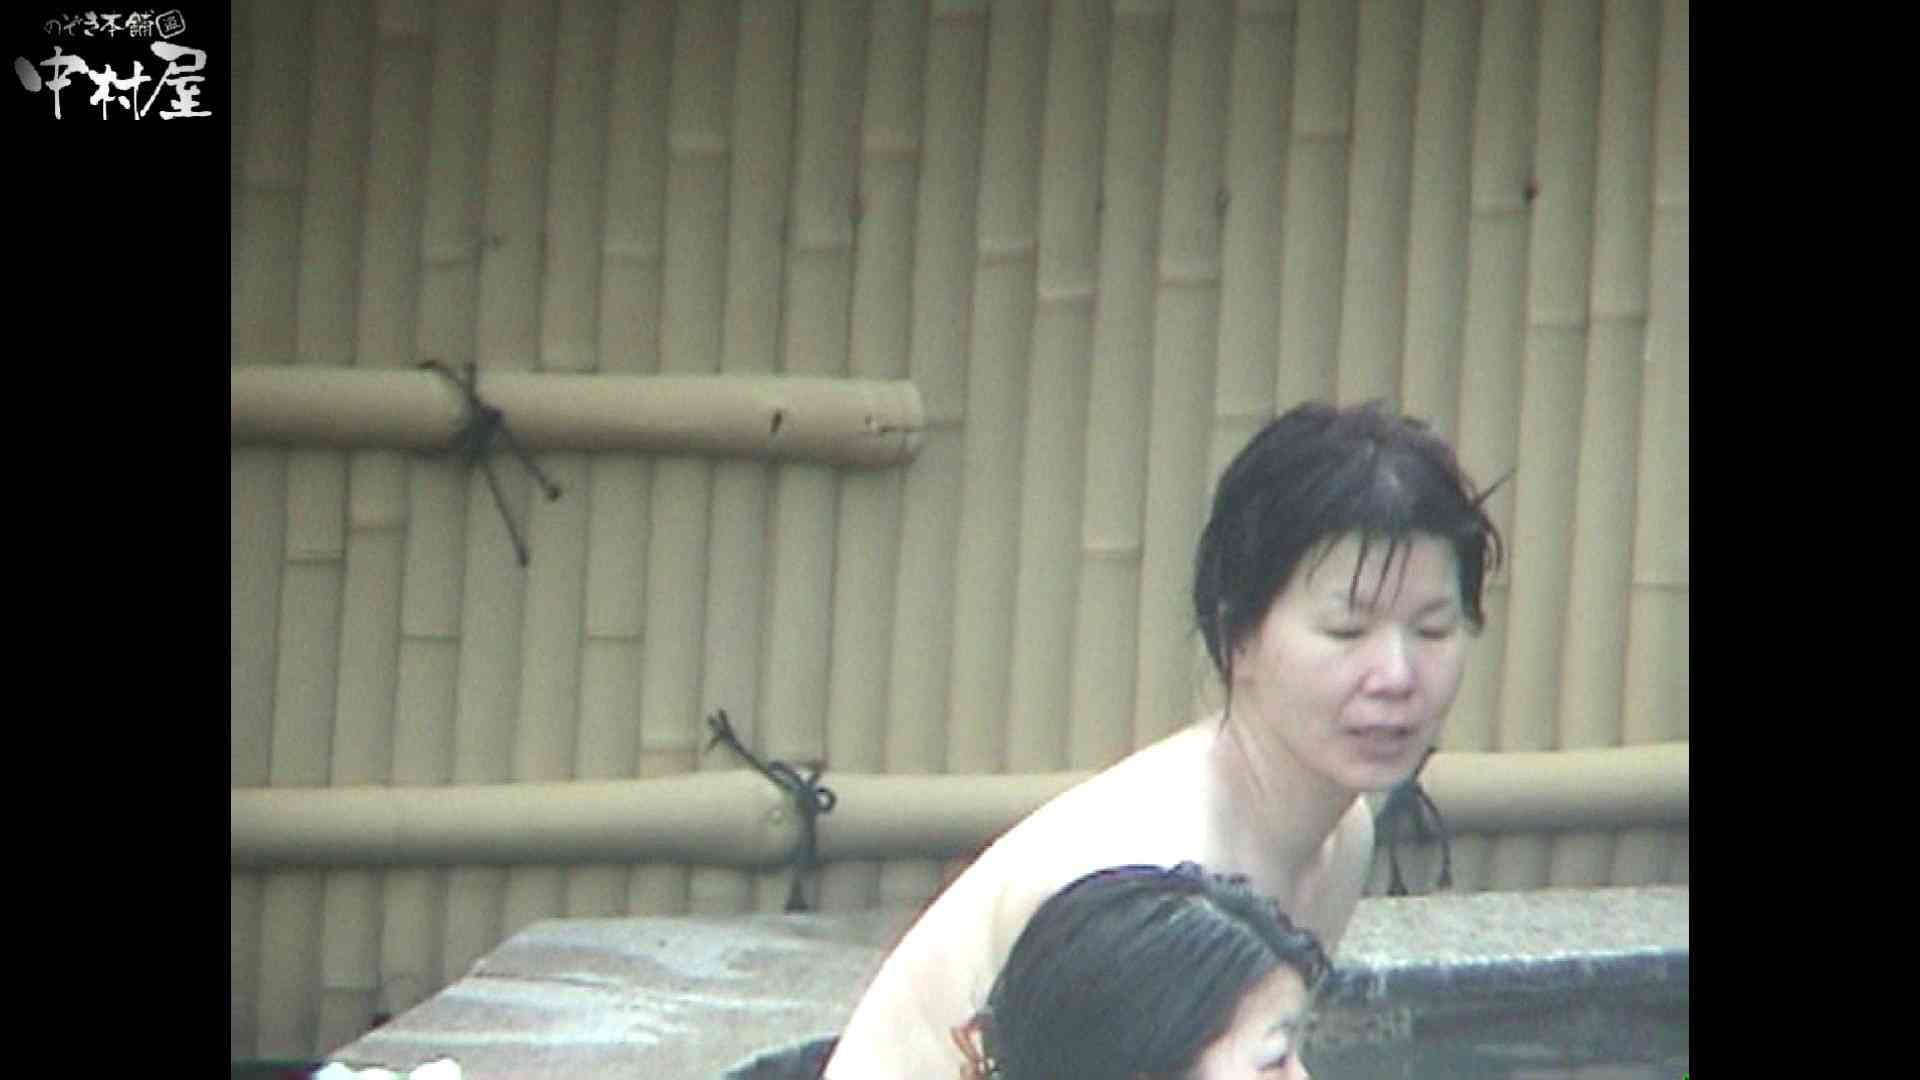 Aquaな露天風呂Vol.936 盗撮映像  110Pix 50